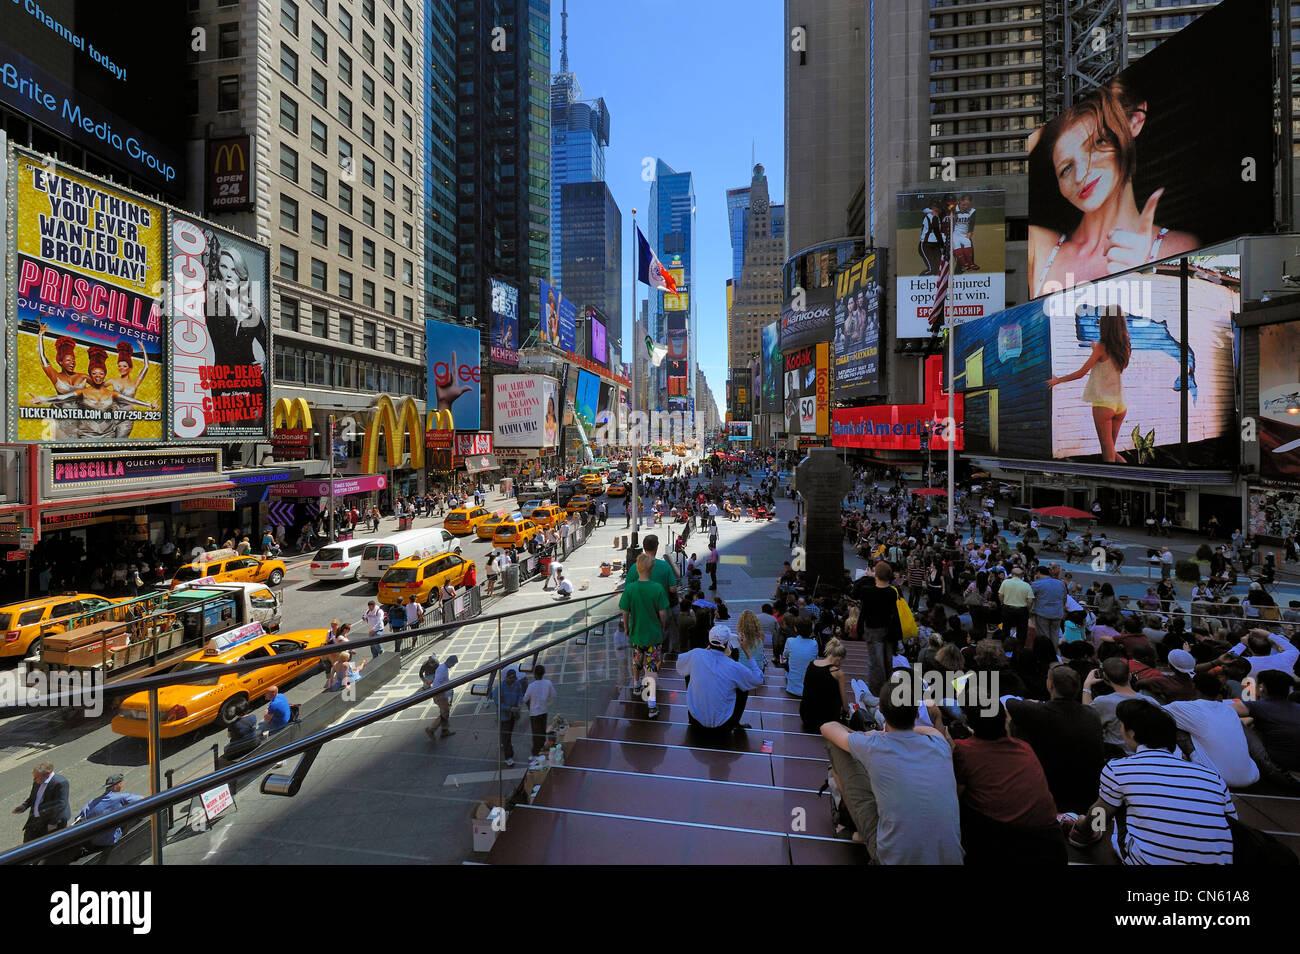 Vereinigte Staaten, New York, Manhattan, Midtown, Times Square, Straßenszene Stockbild